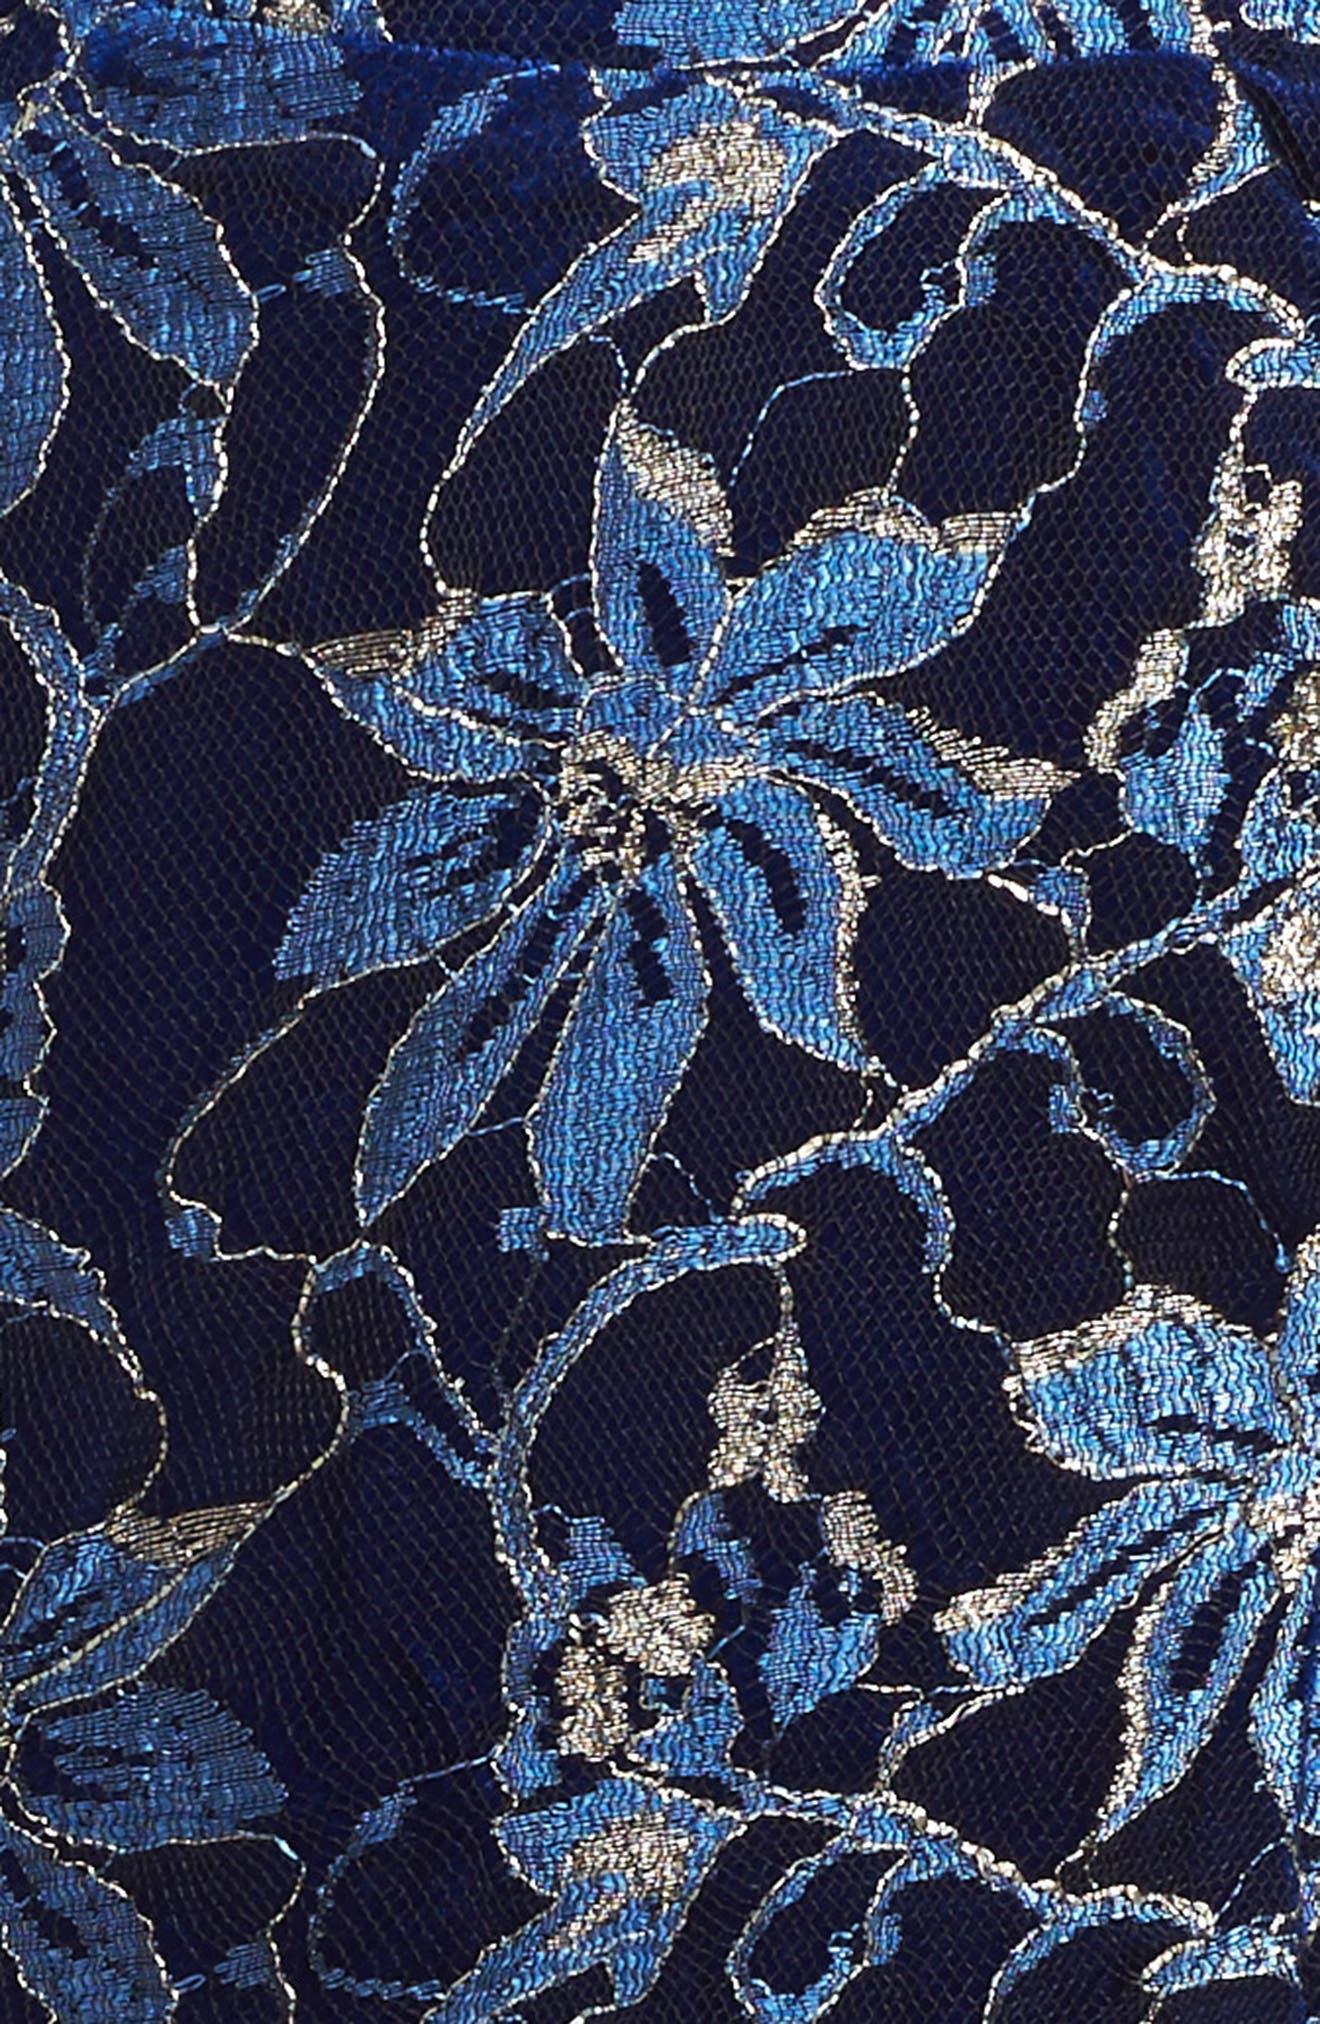 Heather Floral Mesh Dress,                             Alternate thumbnail 3, color,                             420